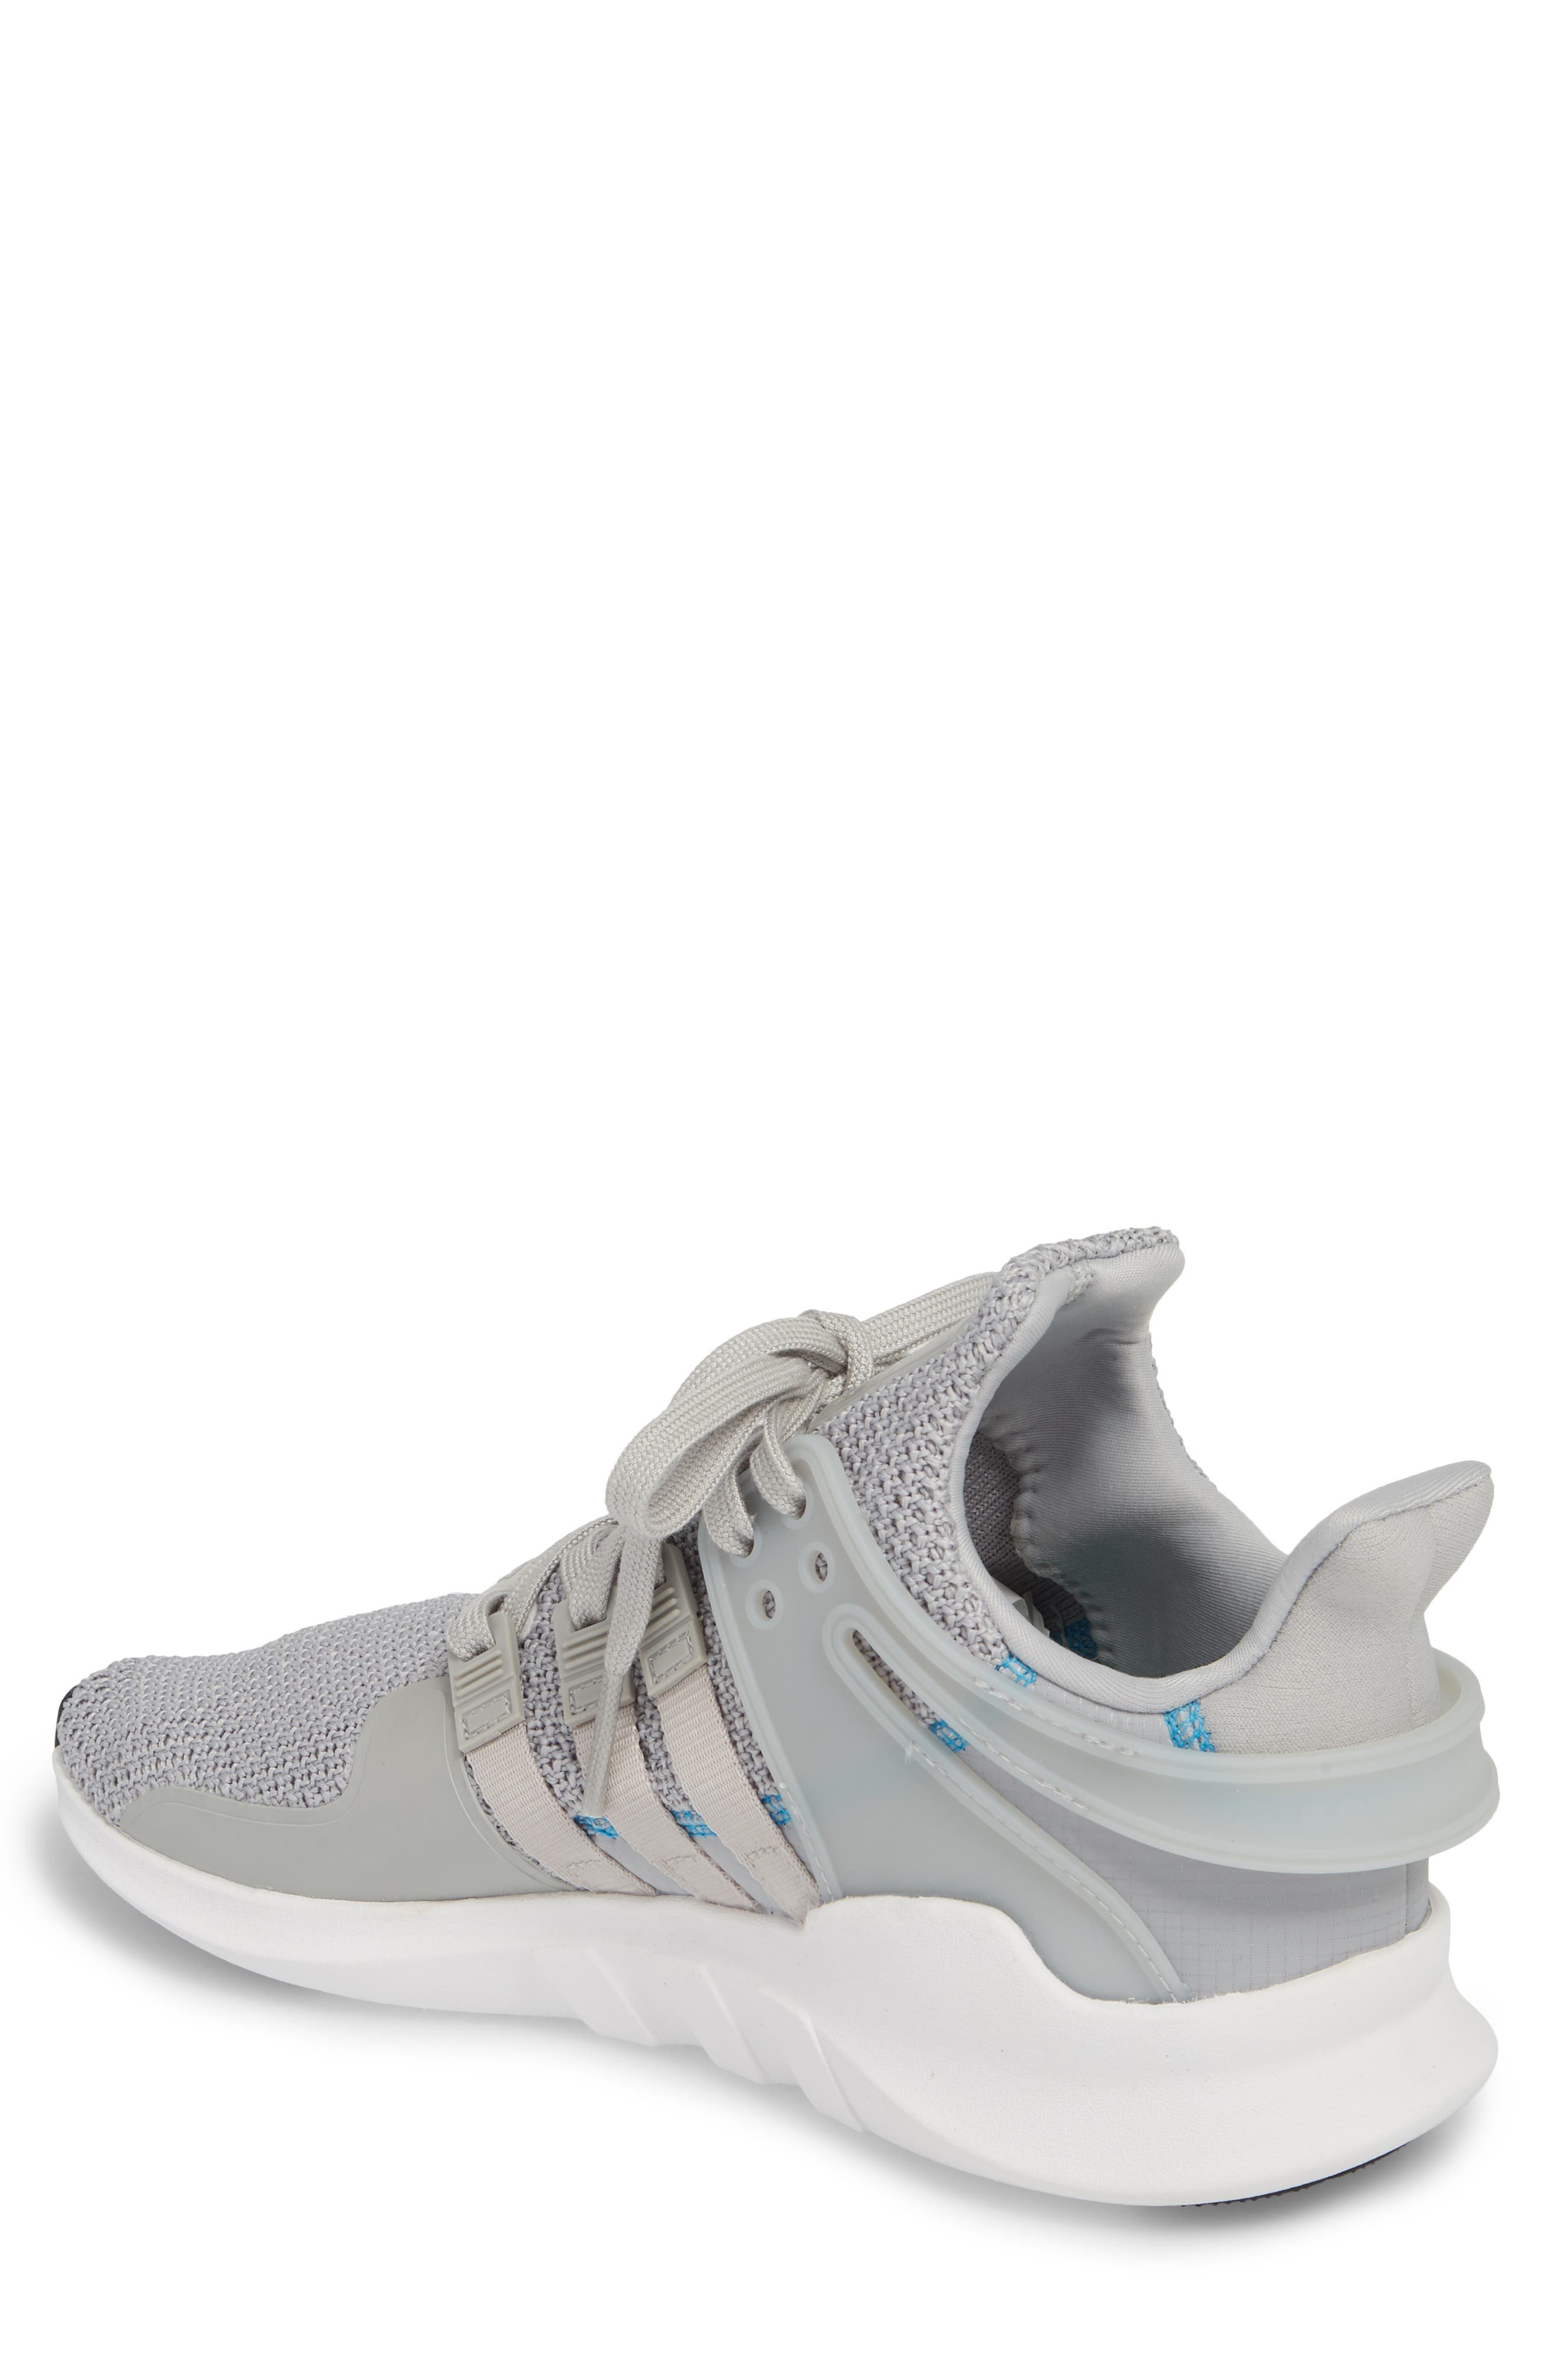 EQT Support Adv Sneaker,                             Alternate thumbnail 2, color,                             Grey/ White